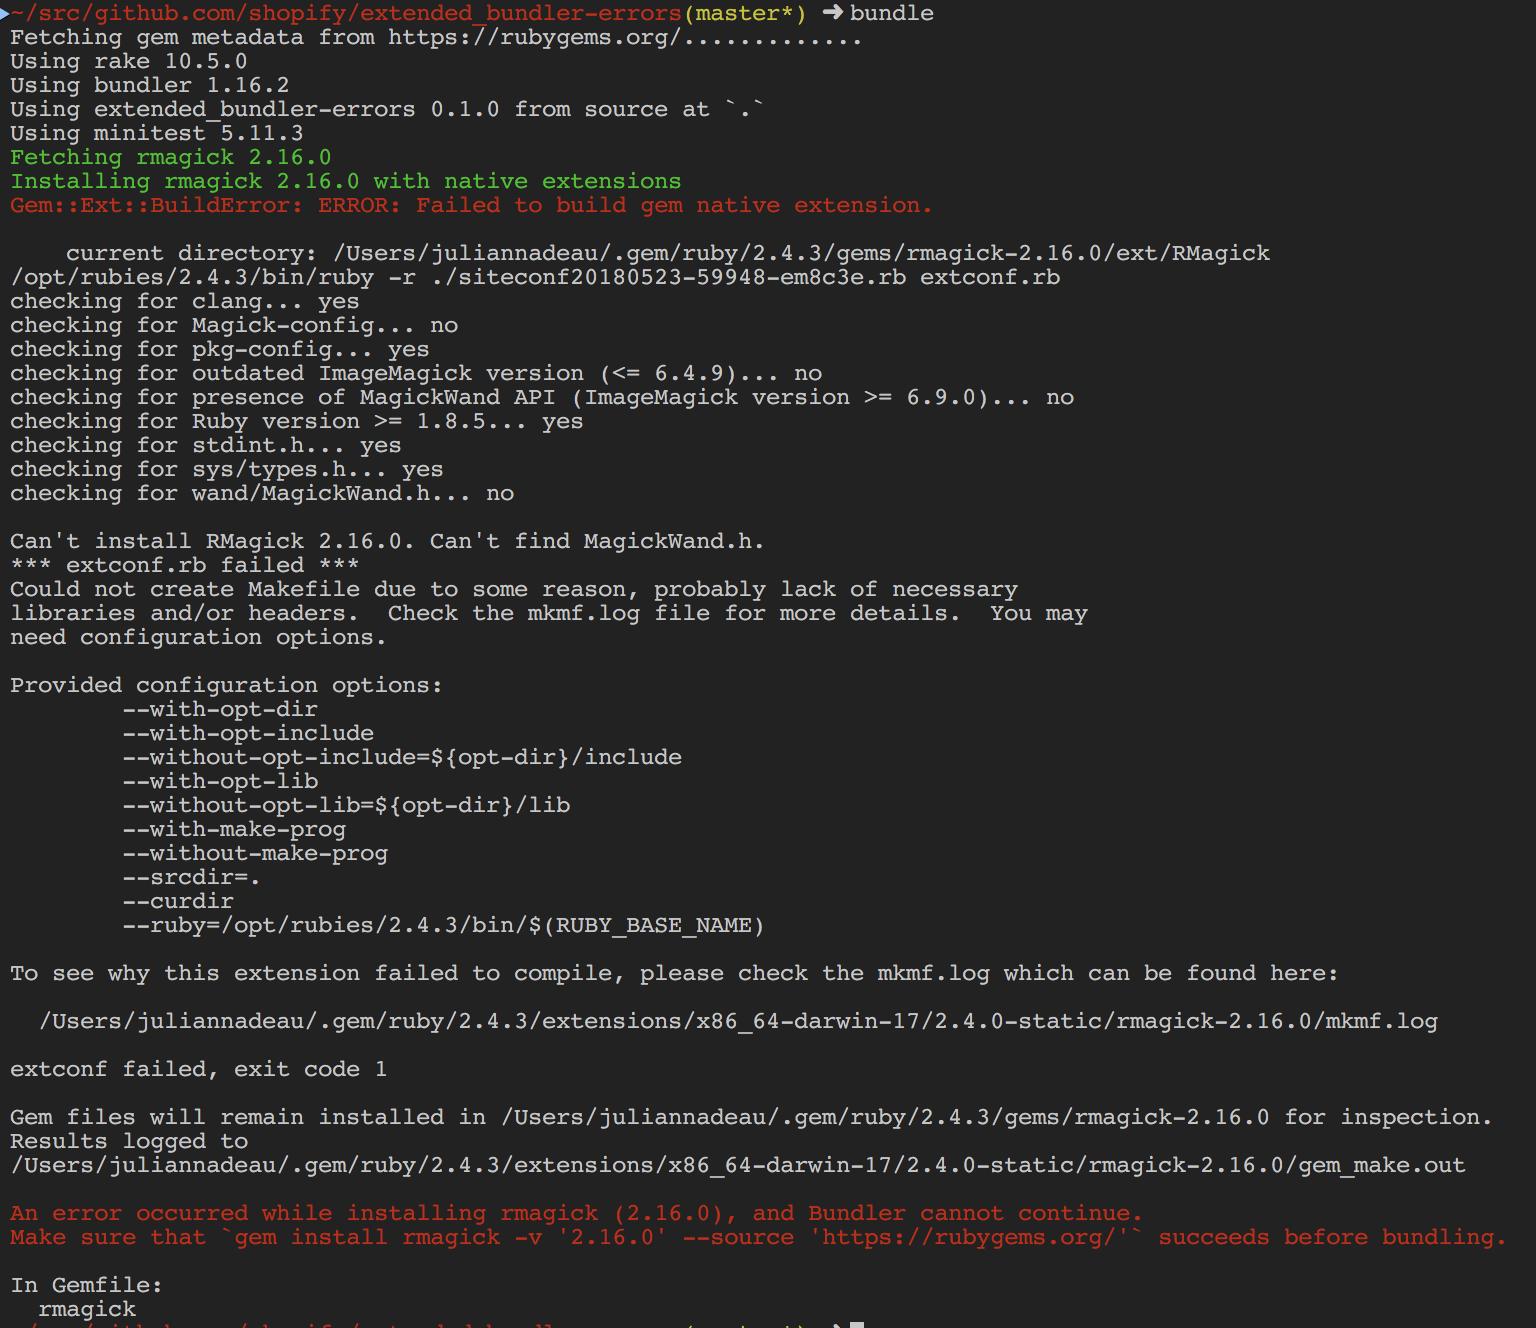 Gem Install file: readme — documentation for extended_bundler-errors (0.1.0)